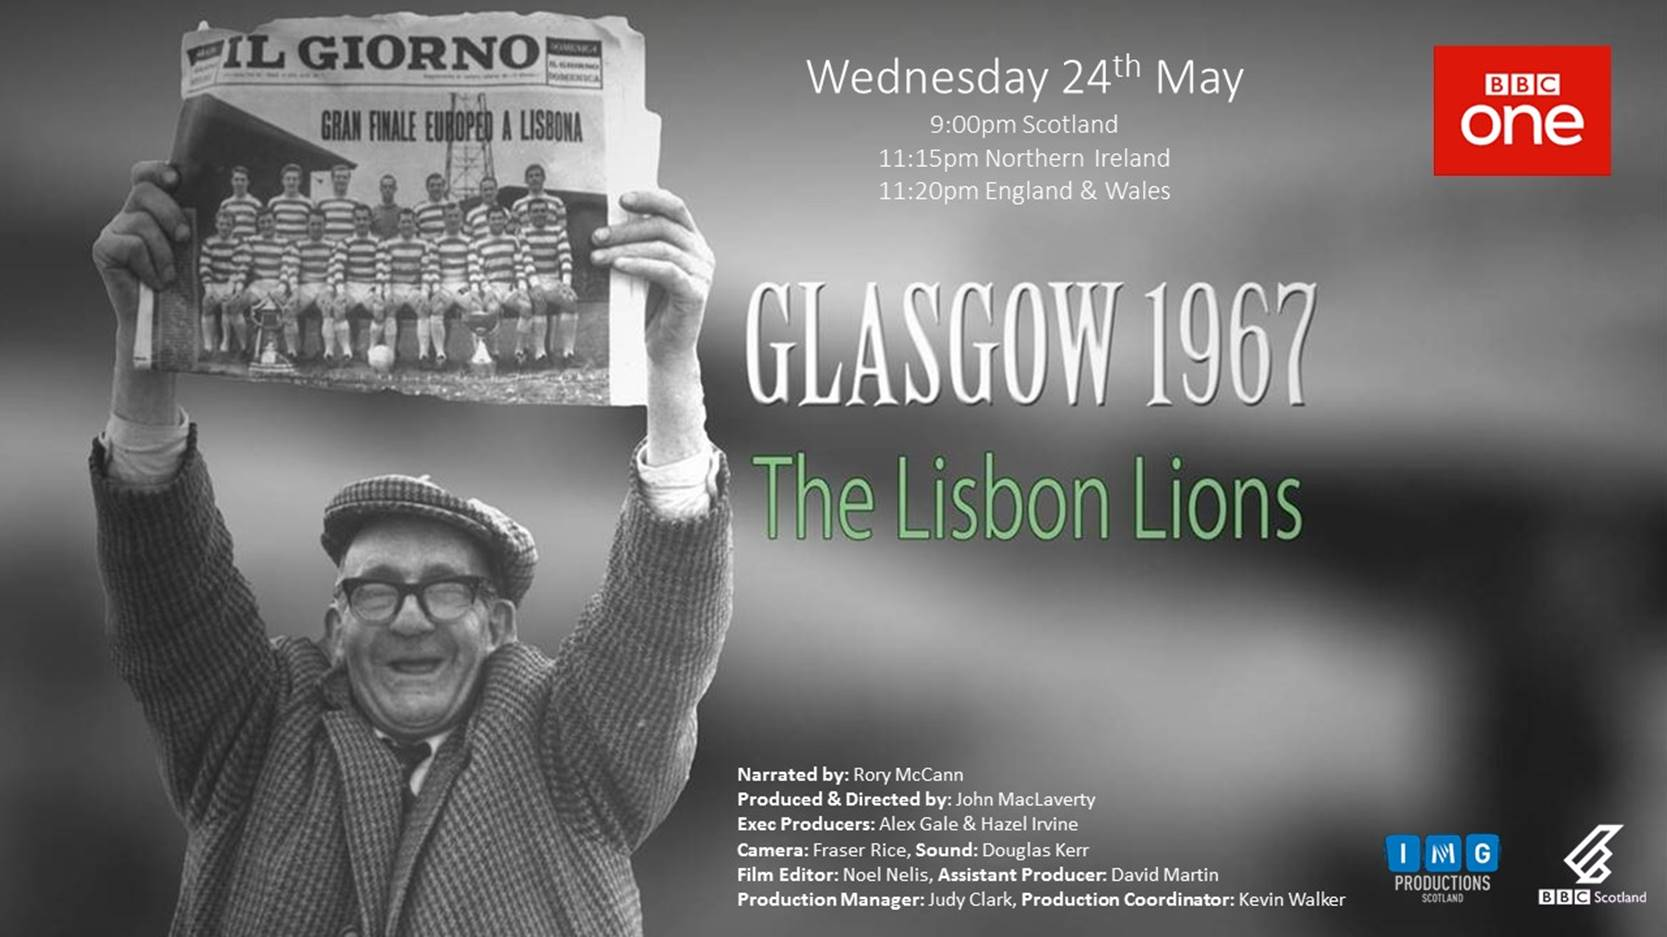 Glasgow 1967, The Lisbon Lions Update